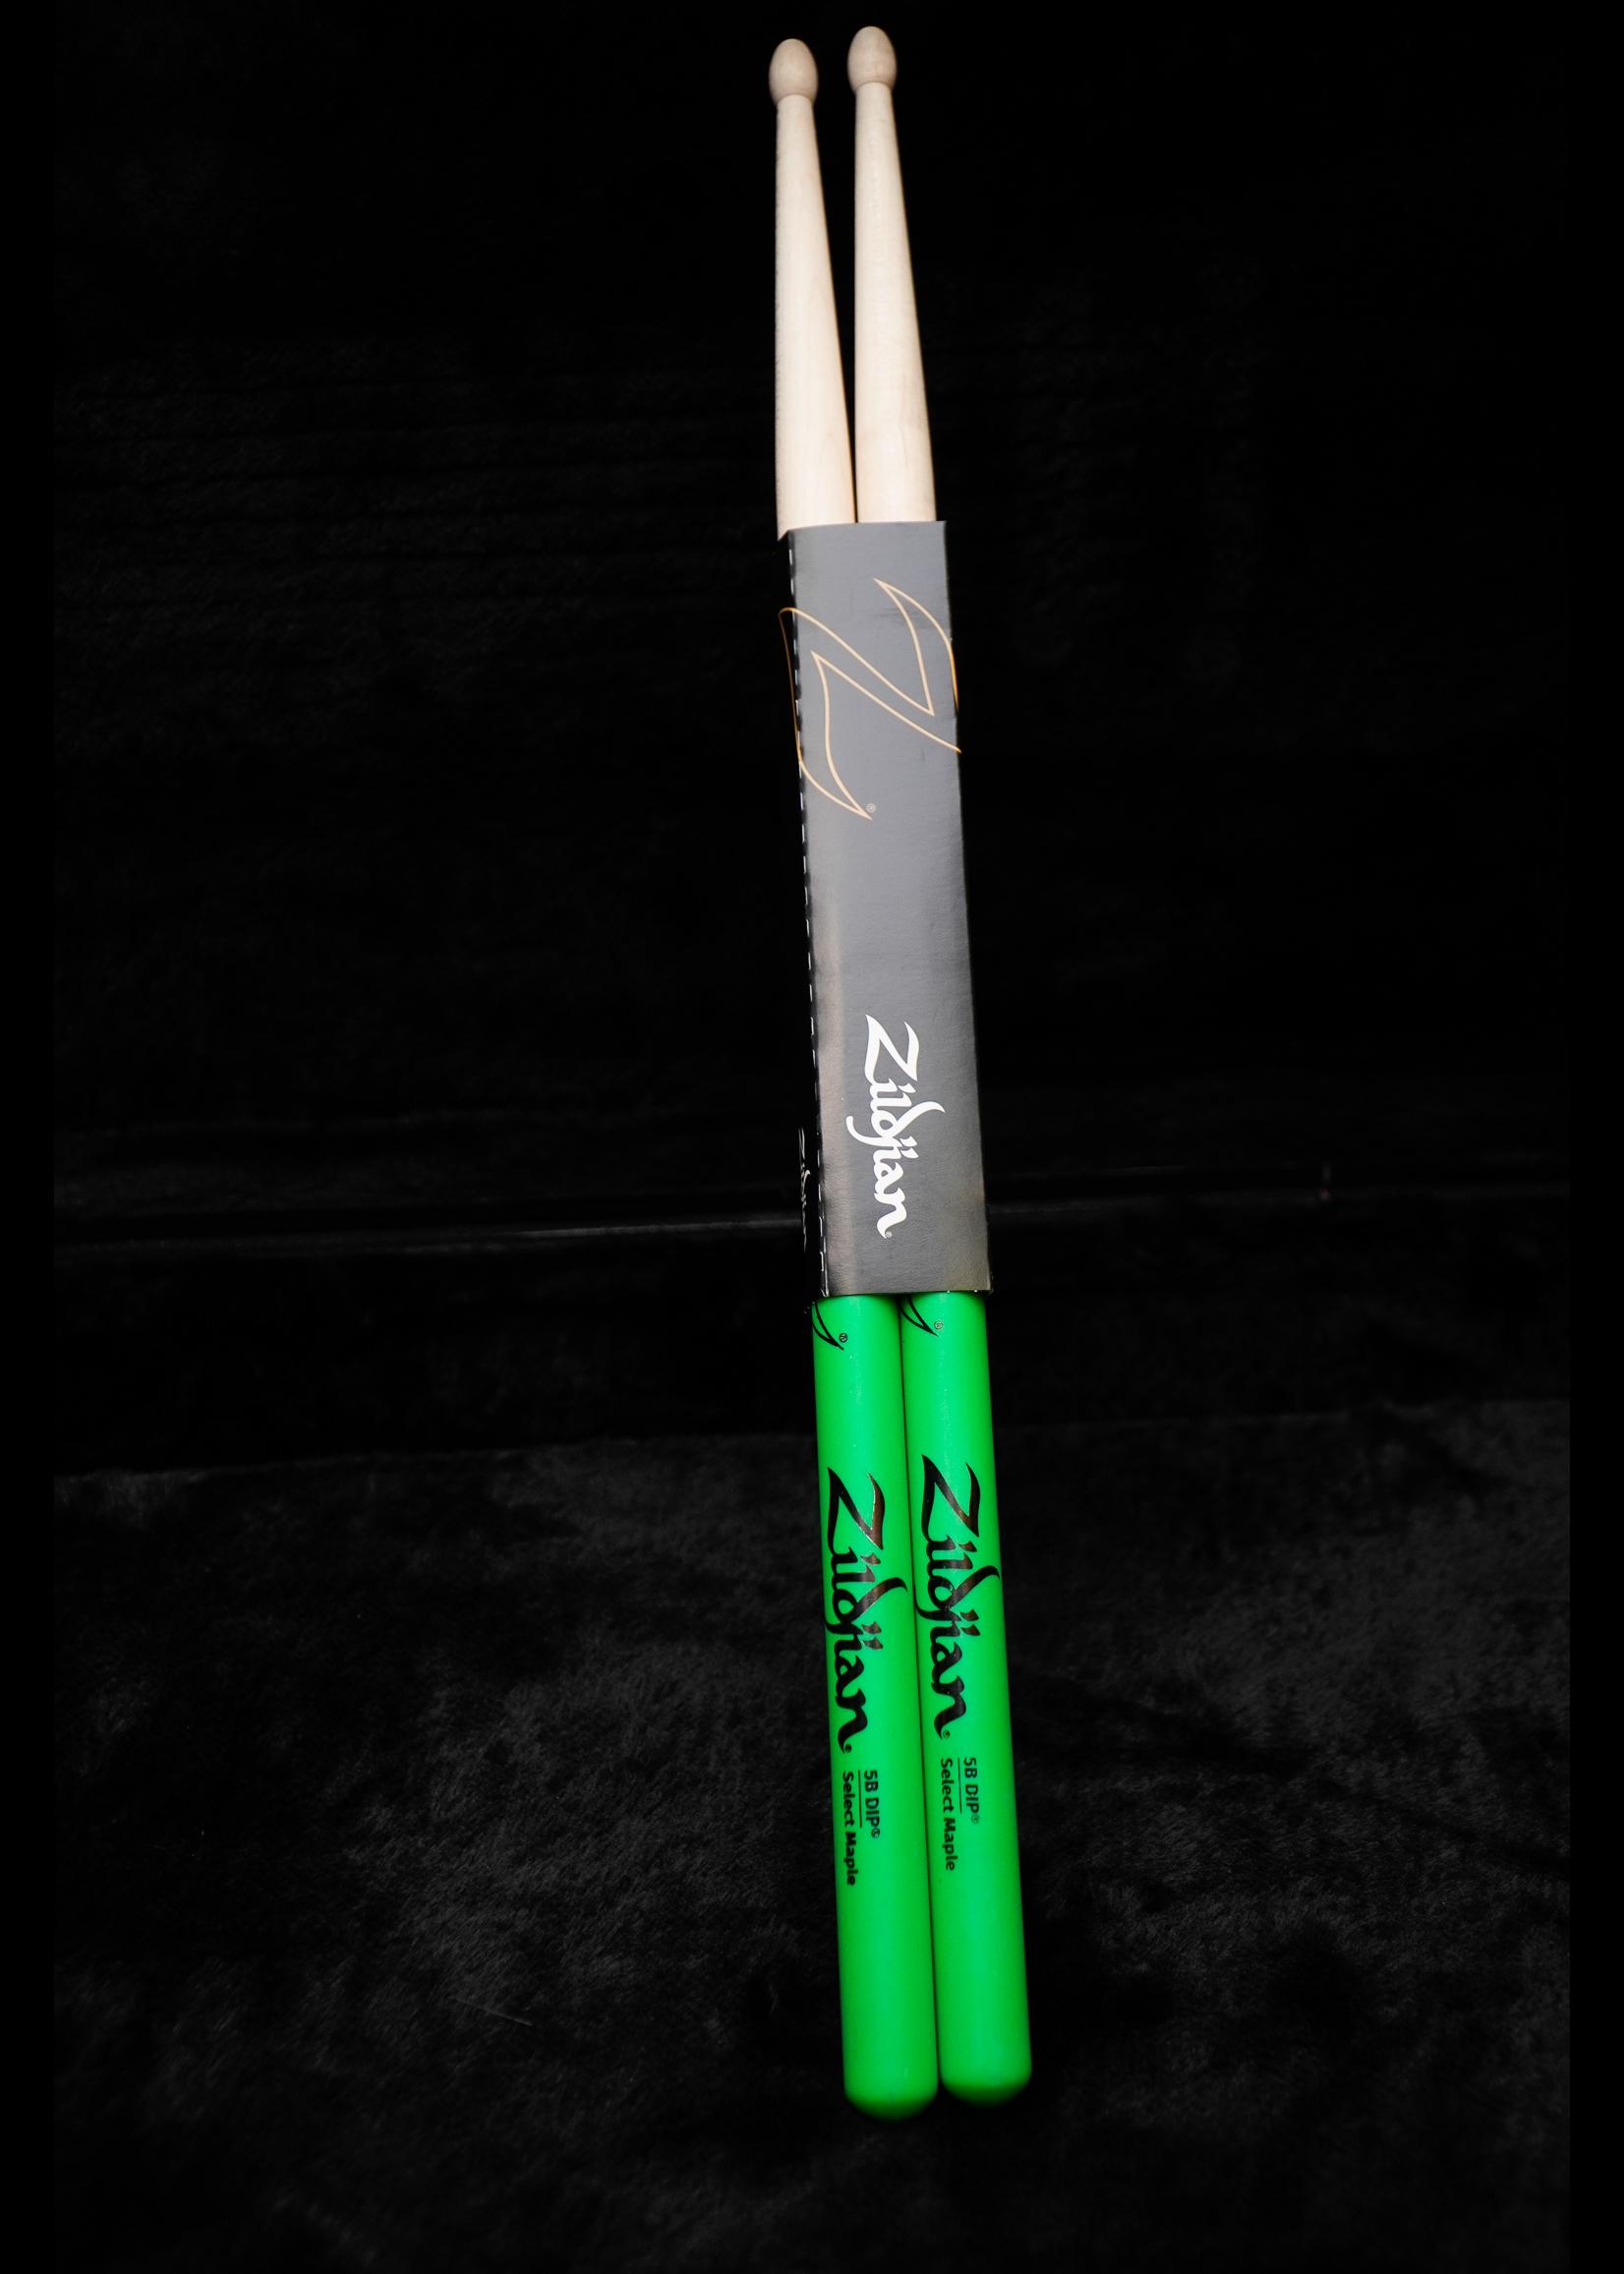 Zildjian Zildjian 5B Drum Sticks